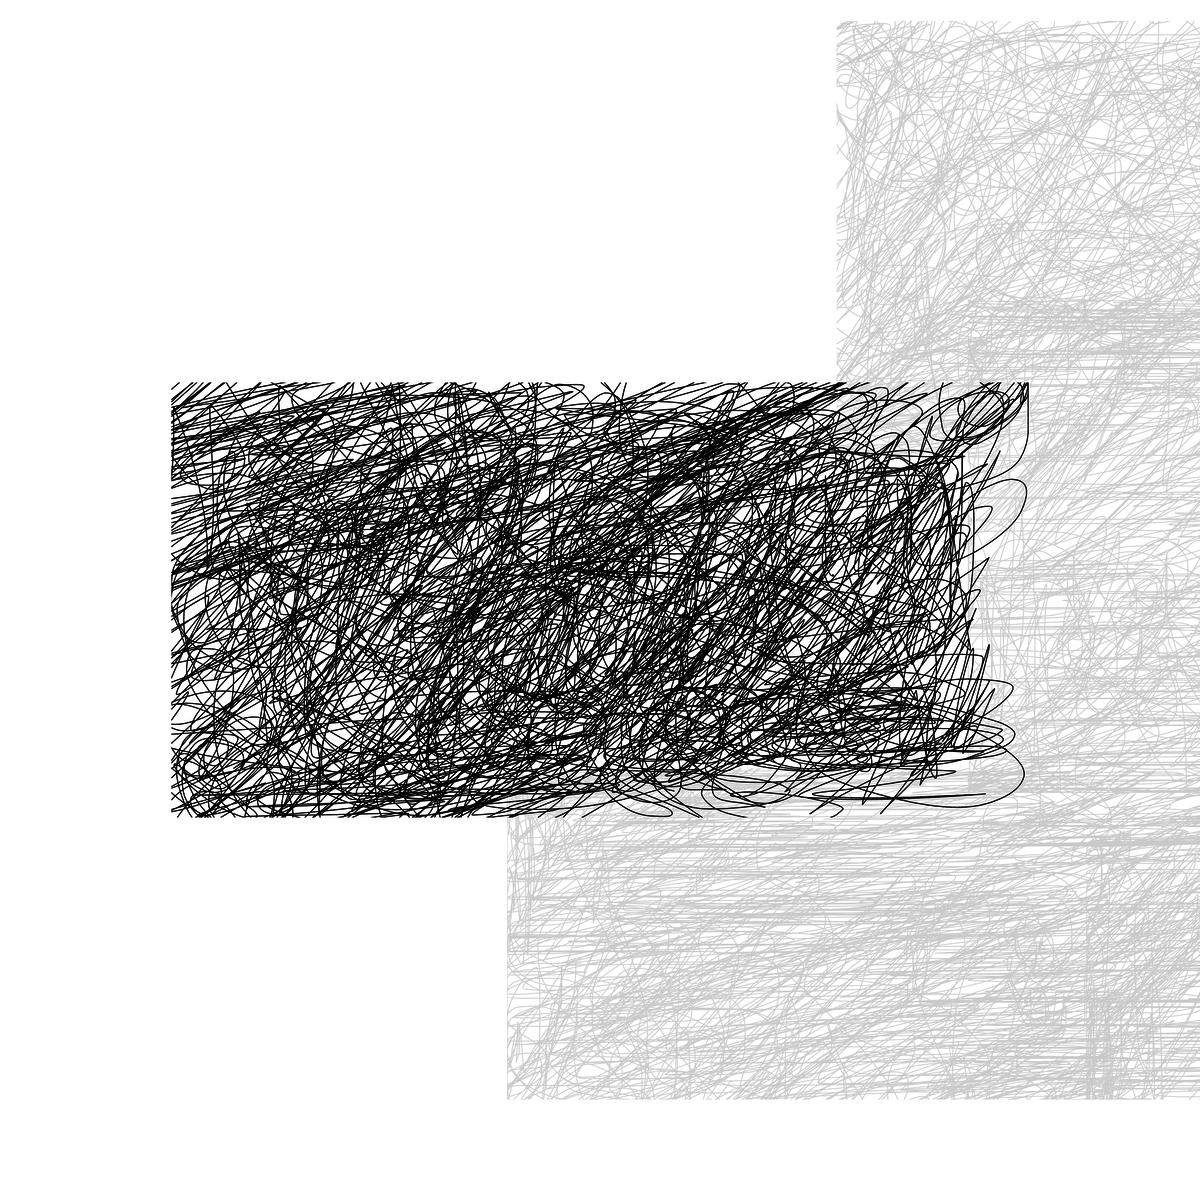 BAAAM drawing#23374 lat:46.5209732055664060lng: 6.6338348388671875